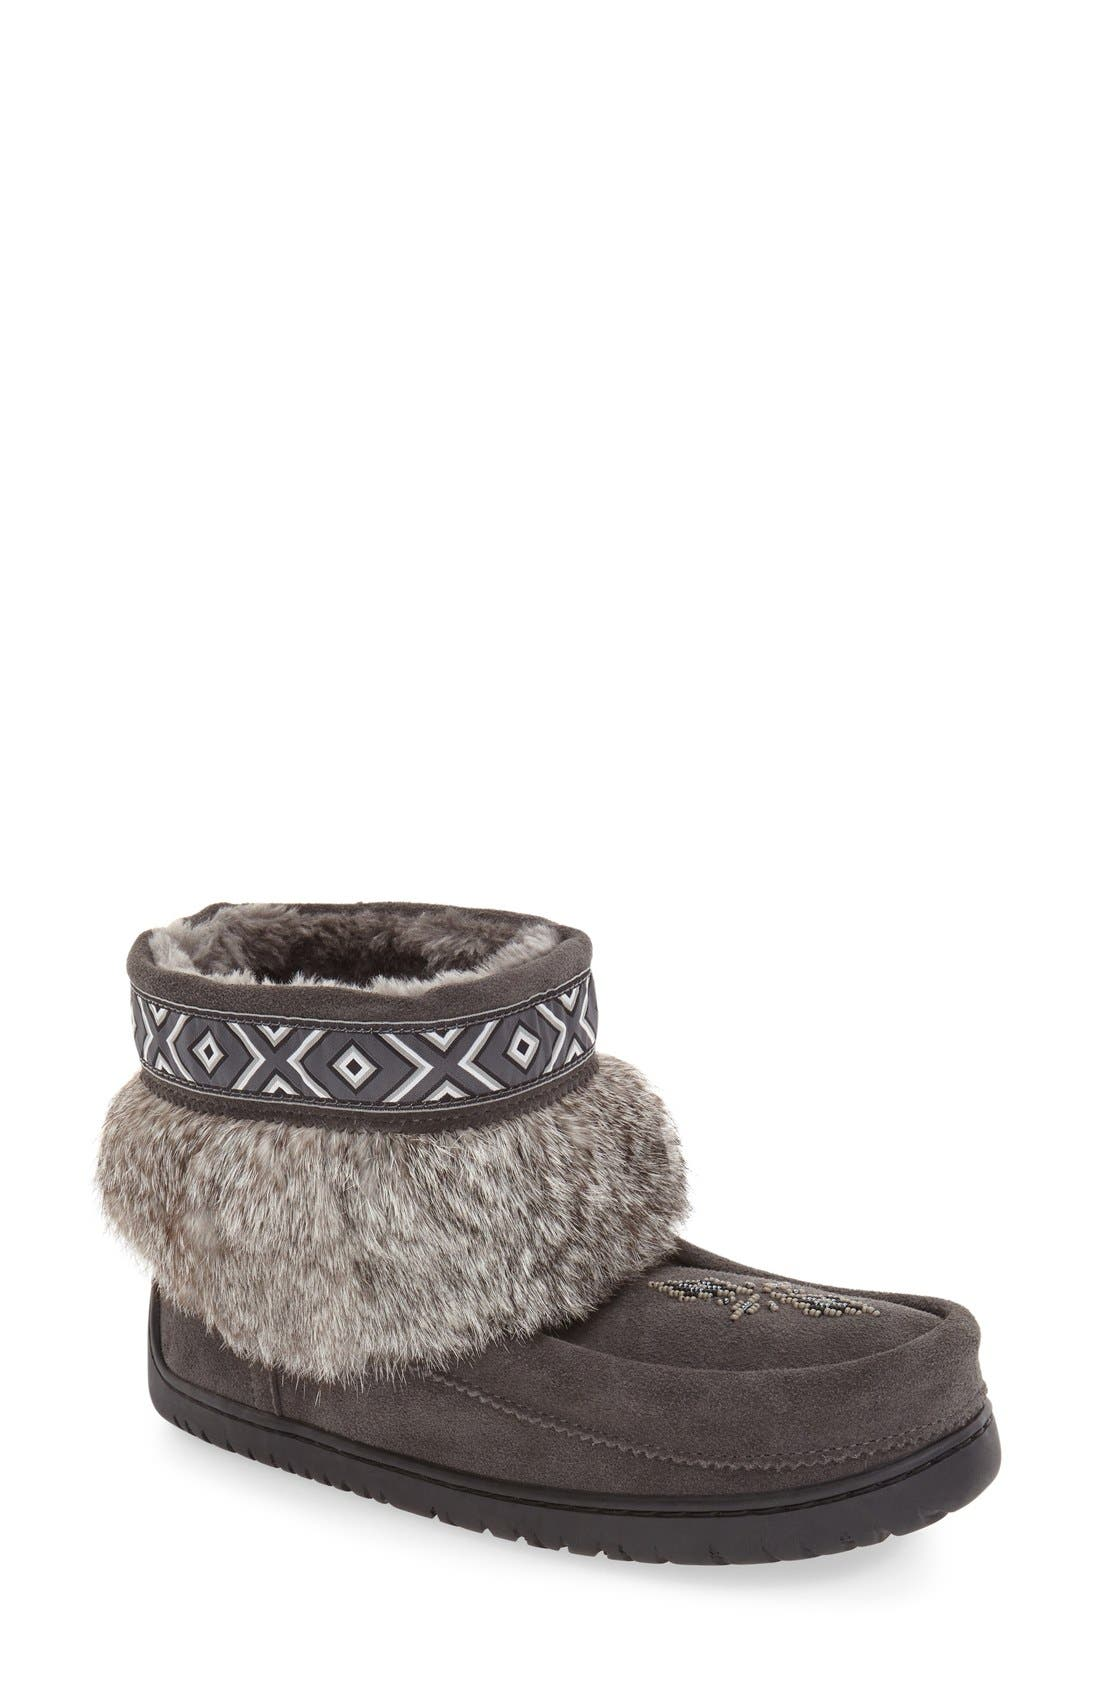 Alternate Image 1 Selected - Manitobah Mukluks 'Keewatin' Genuine Shearling and Rabbit Fur Boot (Women)